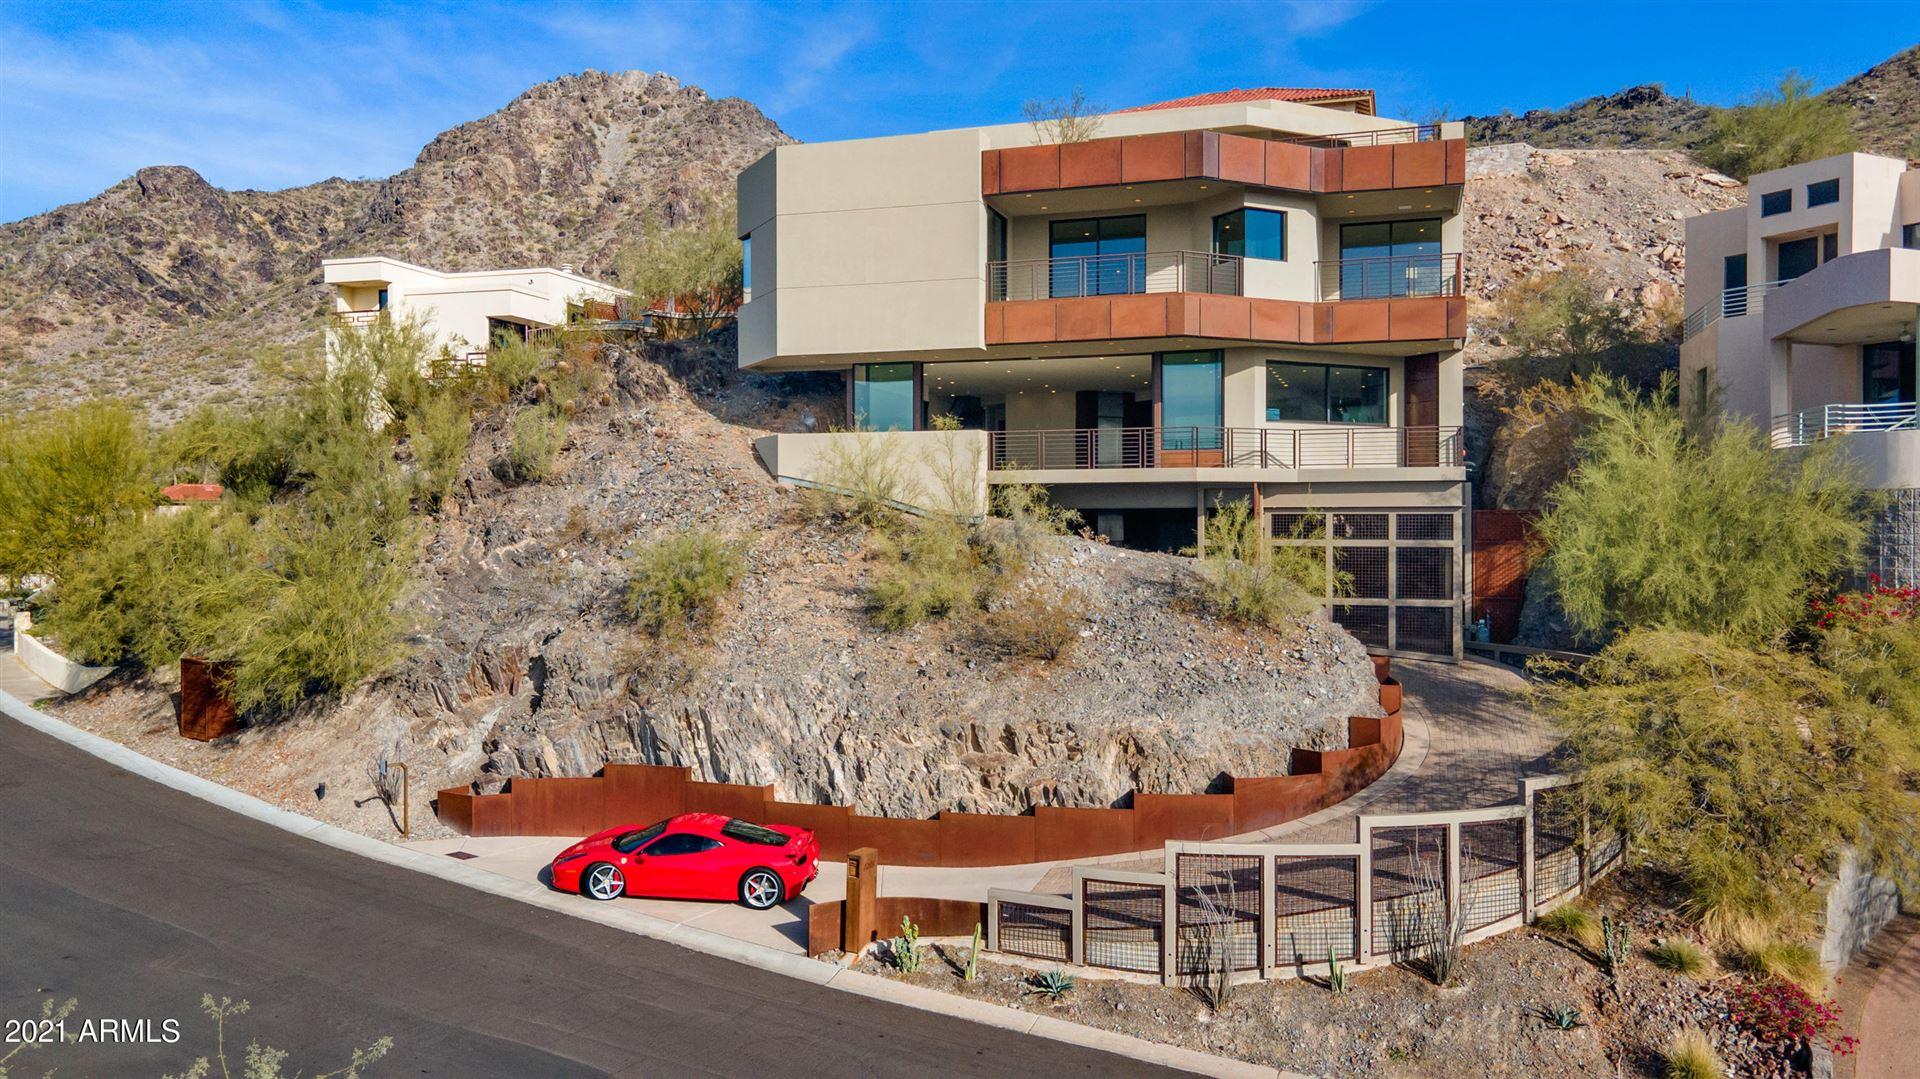 7201 N 23RD Place, Phoenix, AZ 85020 - MLS#: 6183430